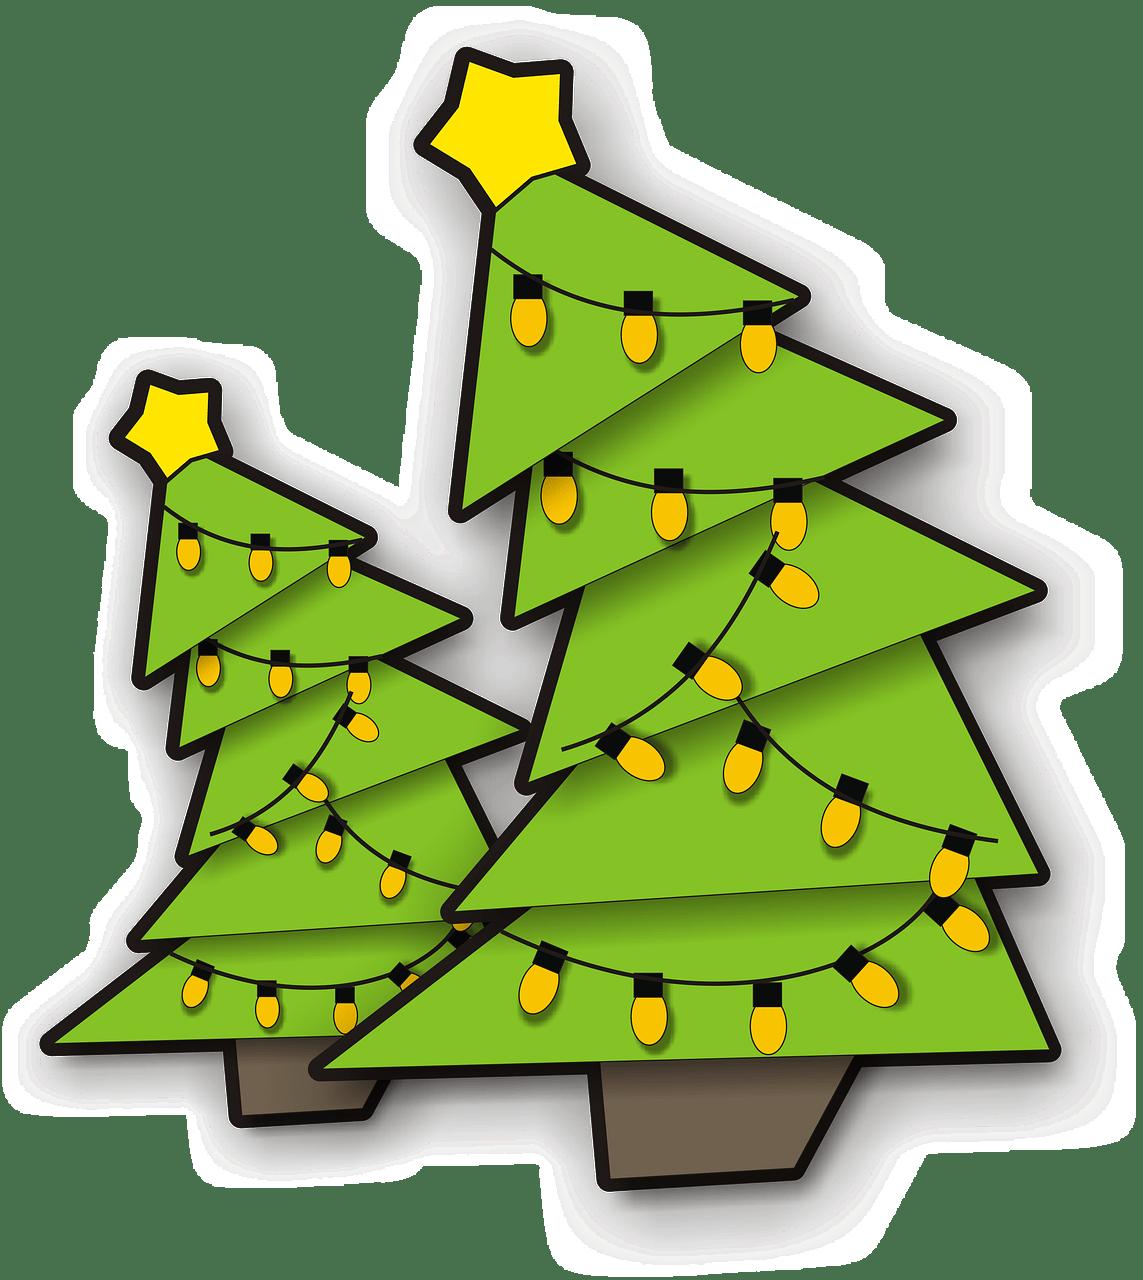 Sapin De Noël Avec Lumière Png Transparents Stickpng